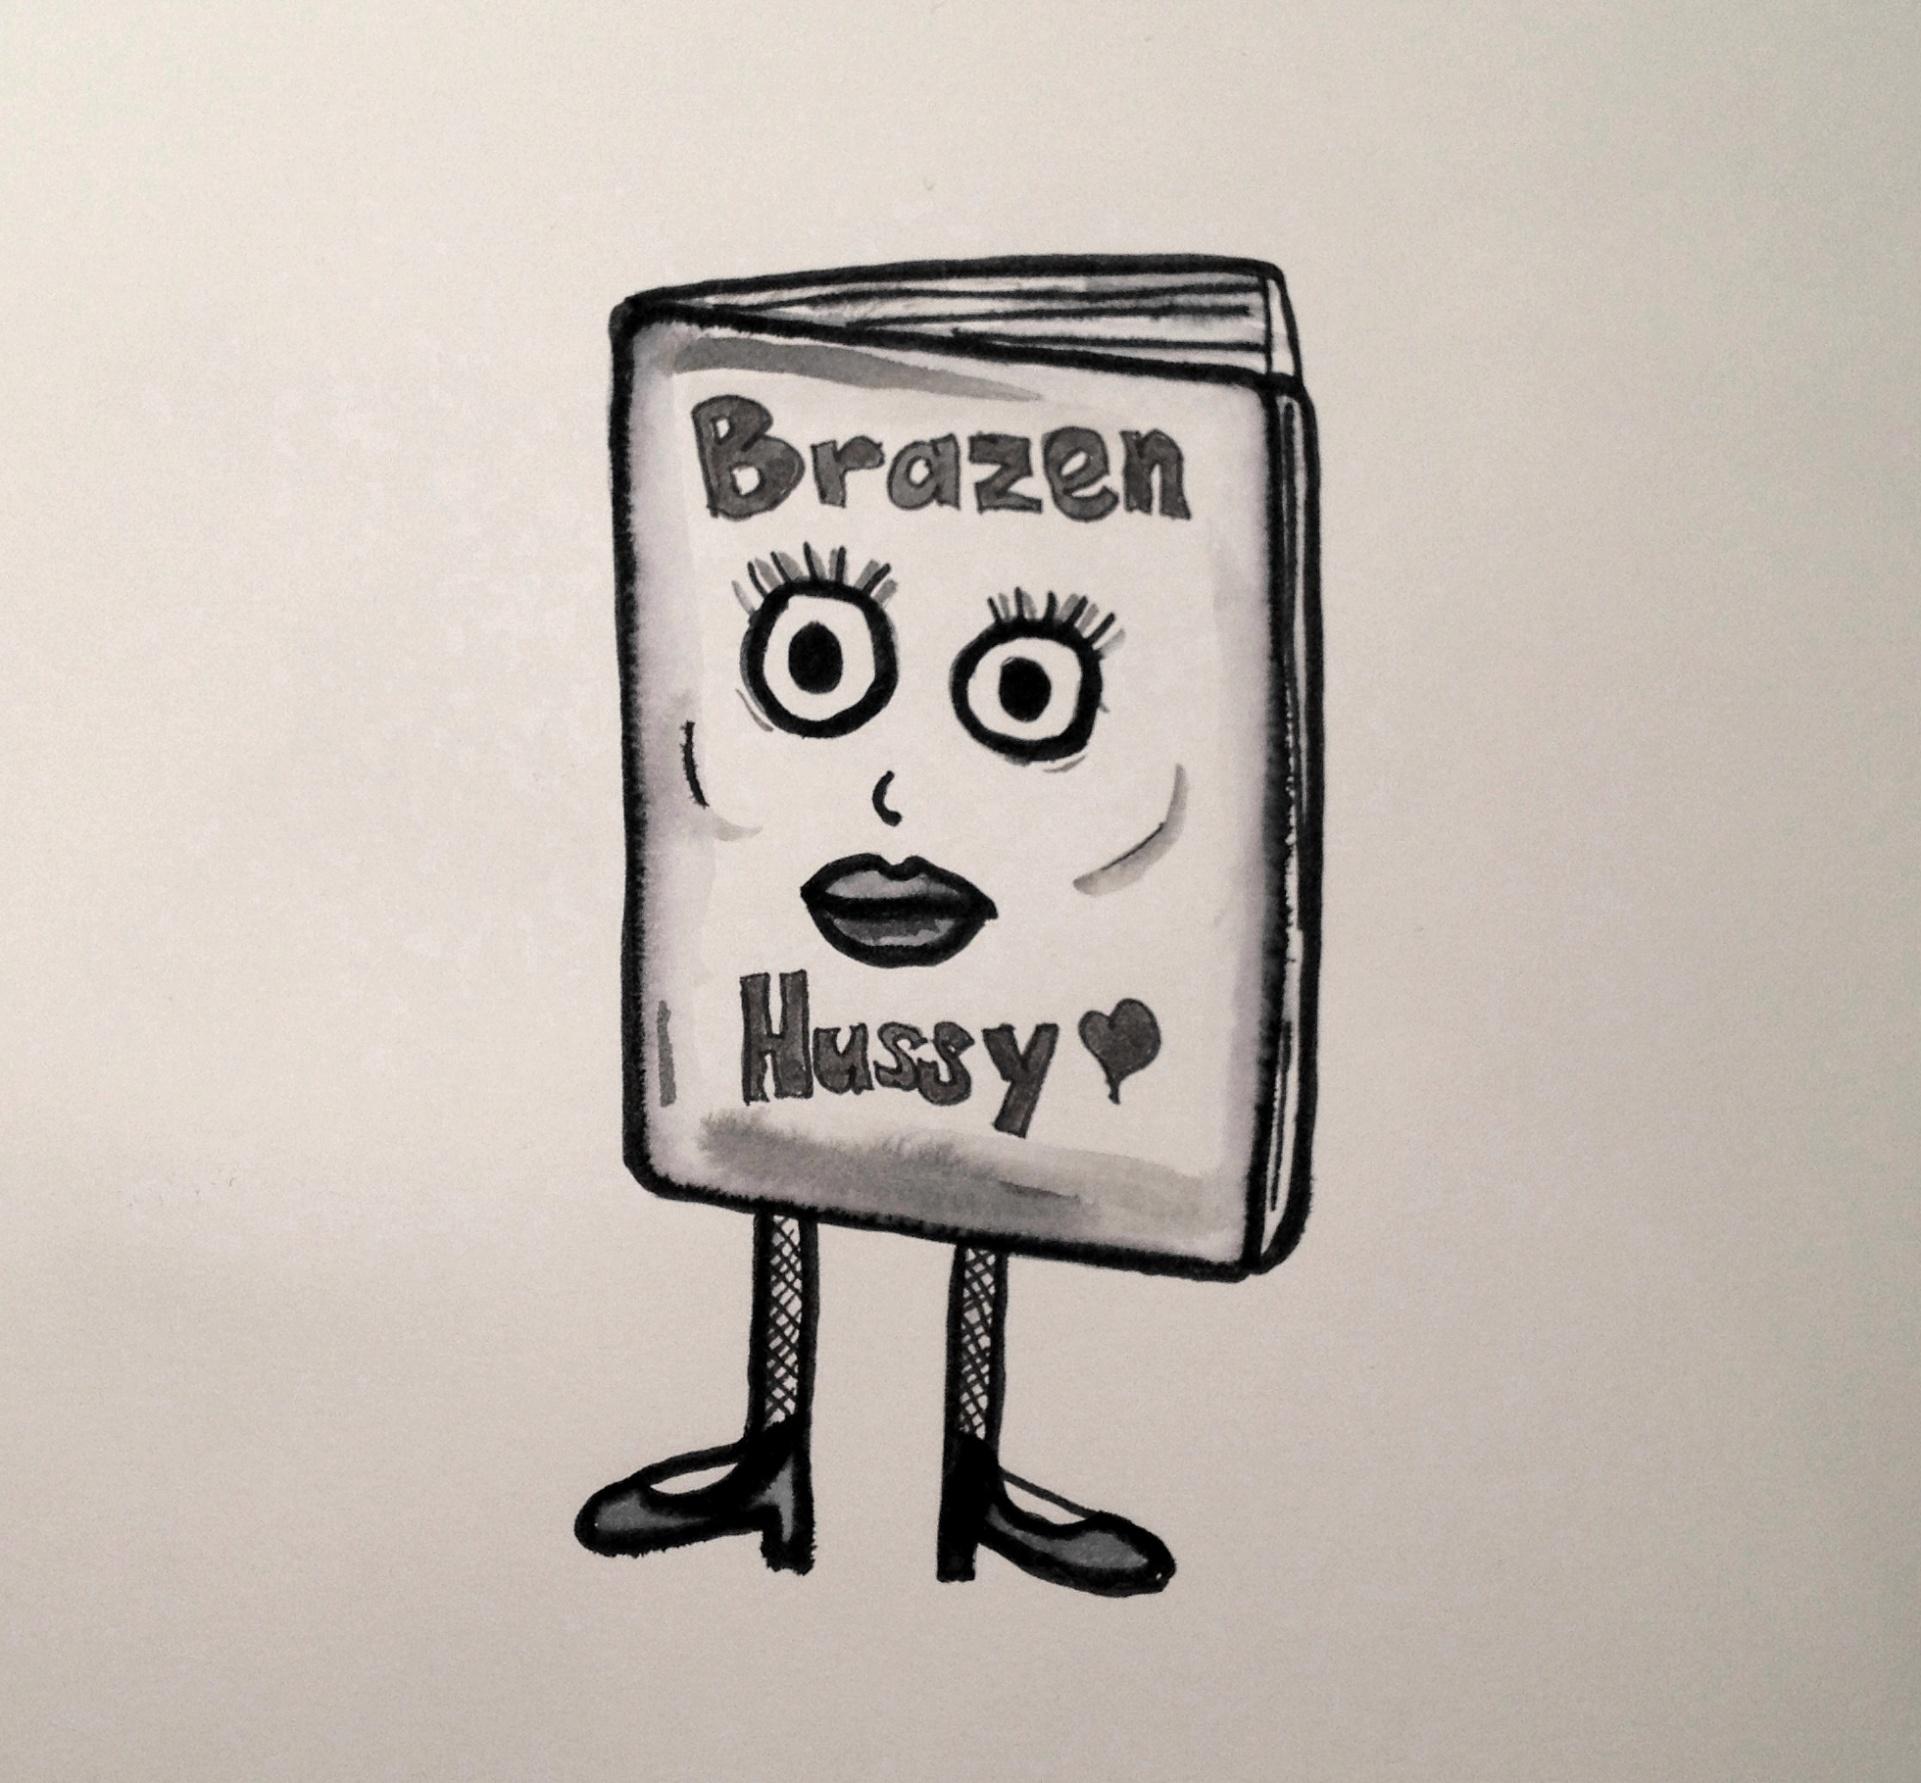 Judge a book